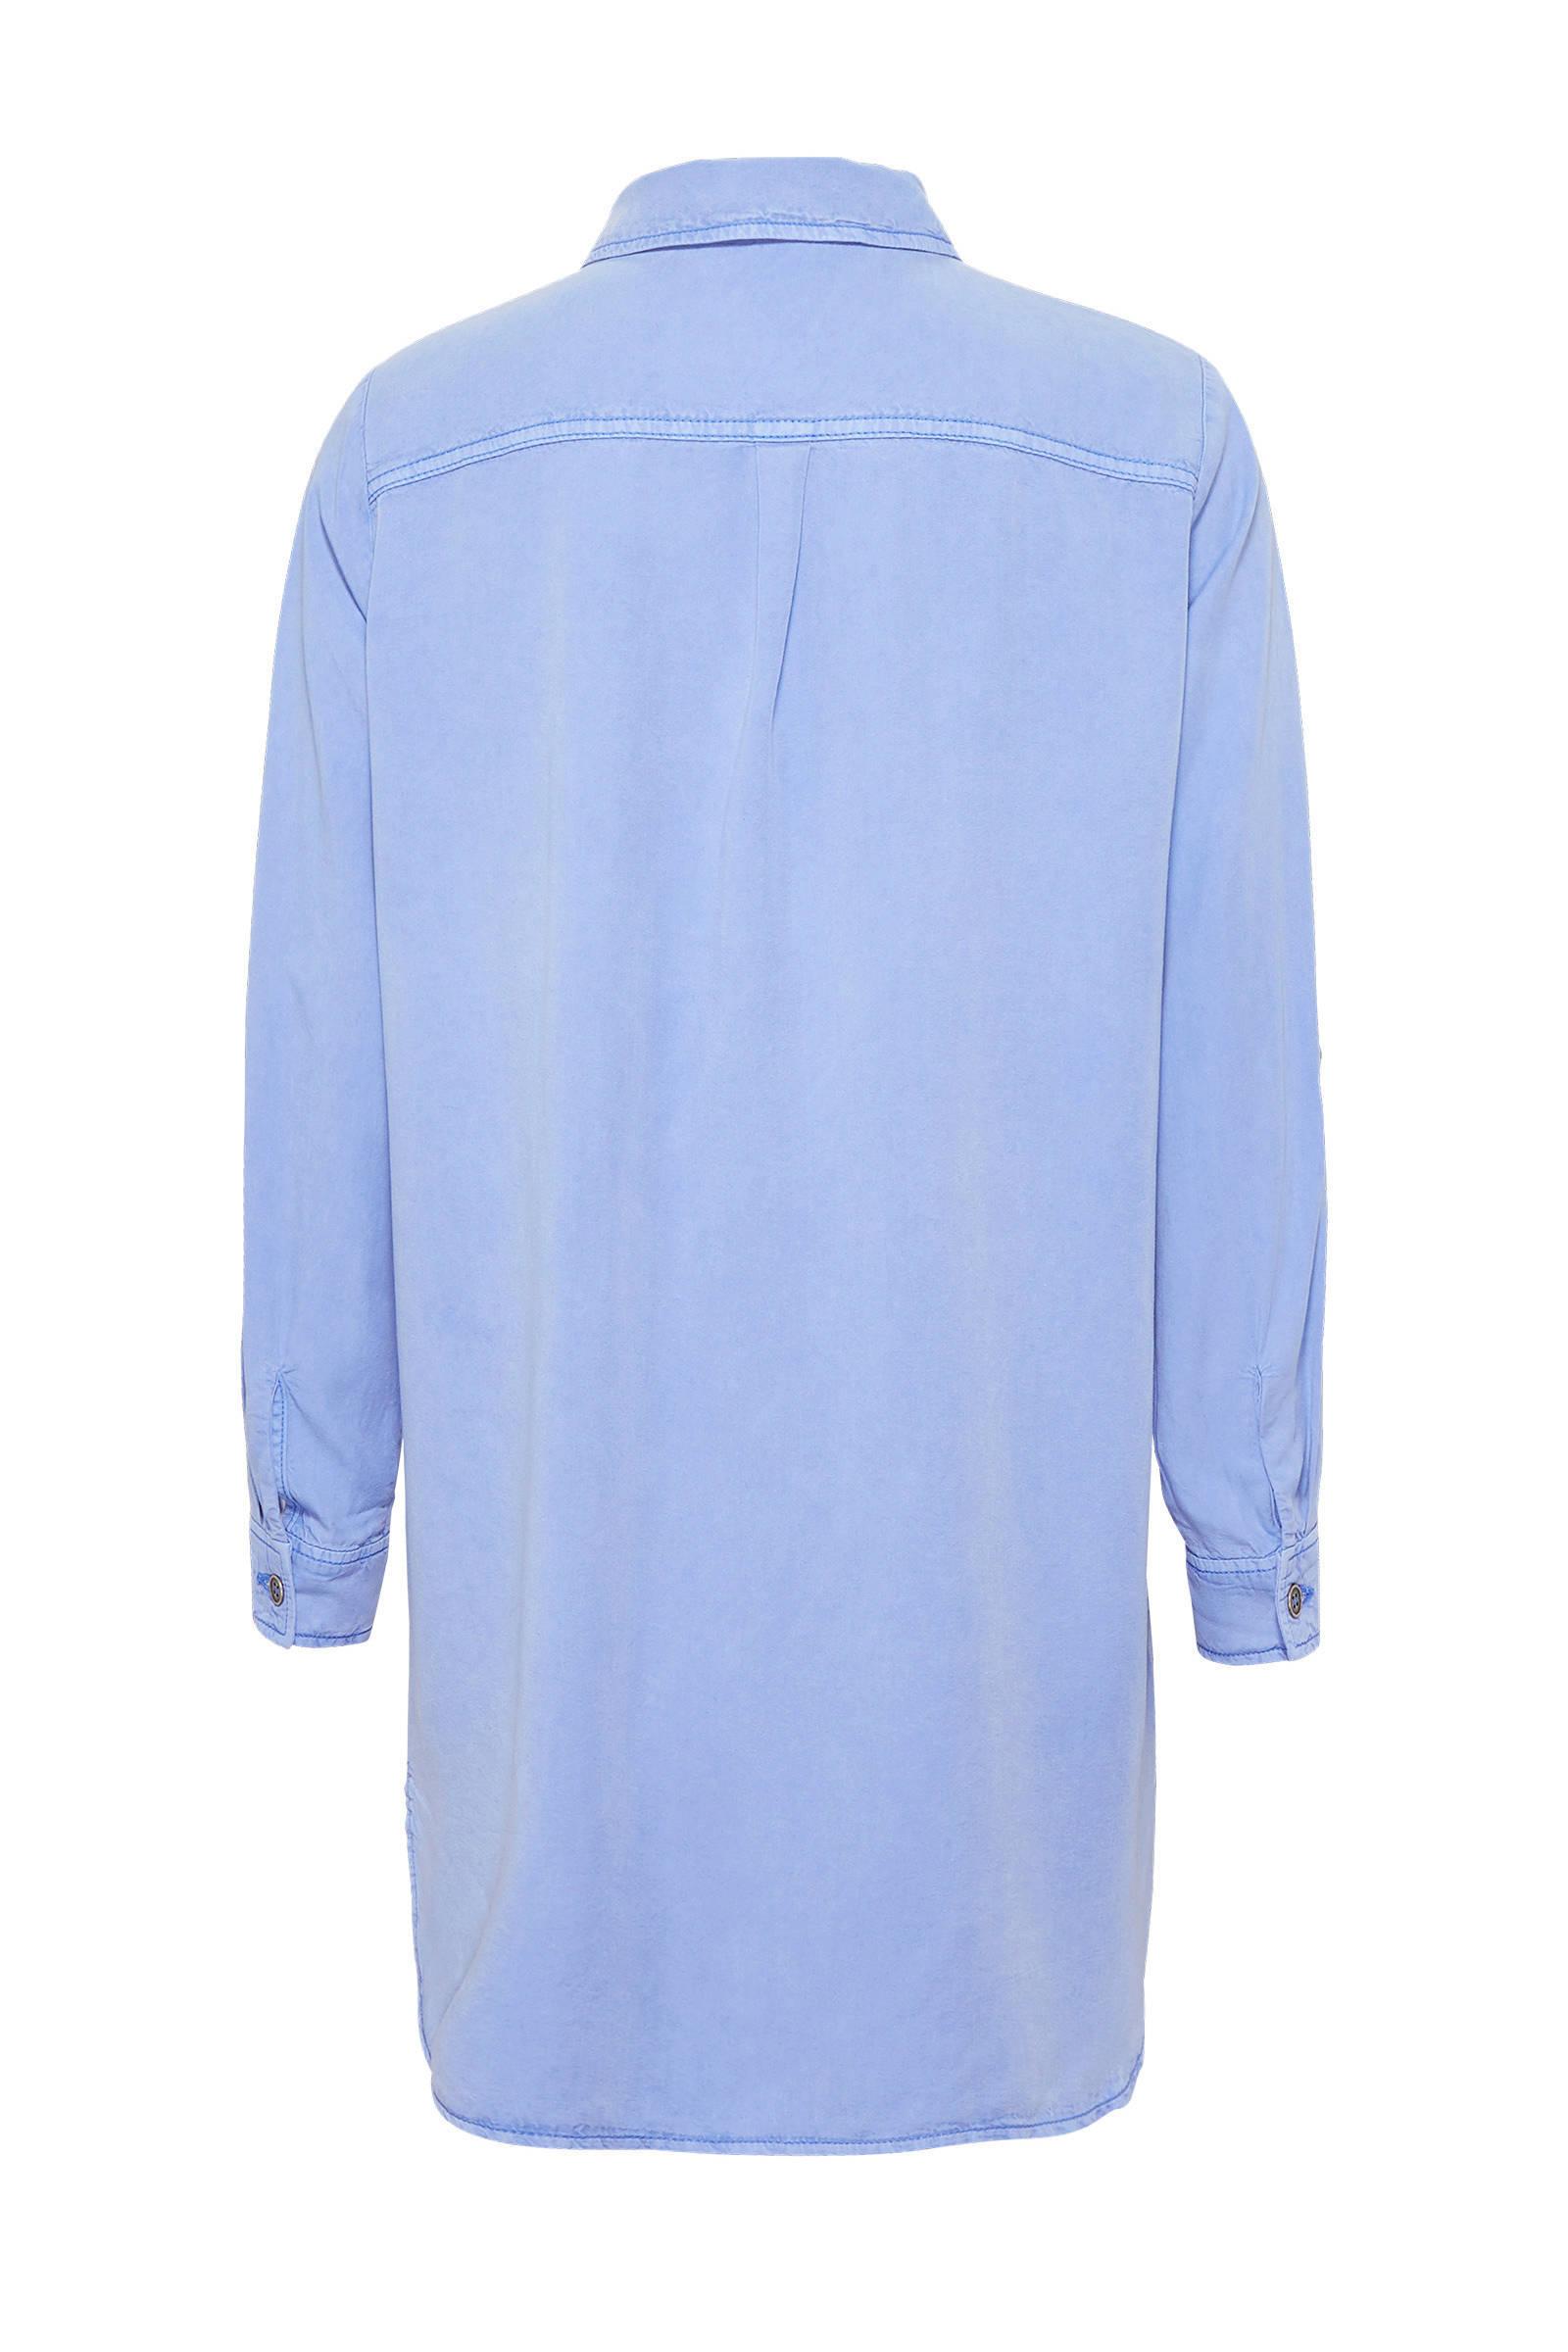 blouse licht licht blauw Didi blouse blauw blouse Didi licht Didi pwHPgqO